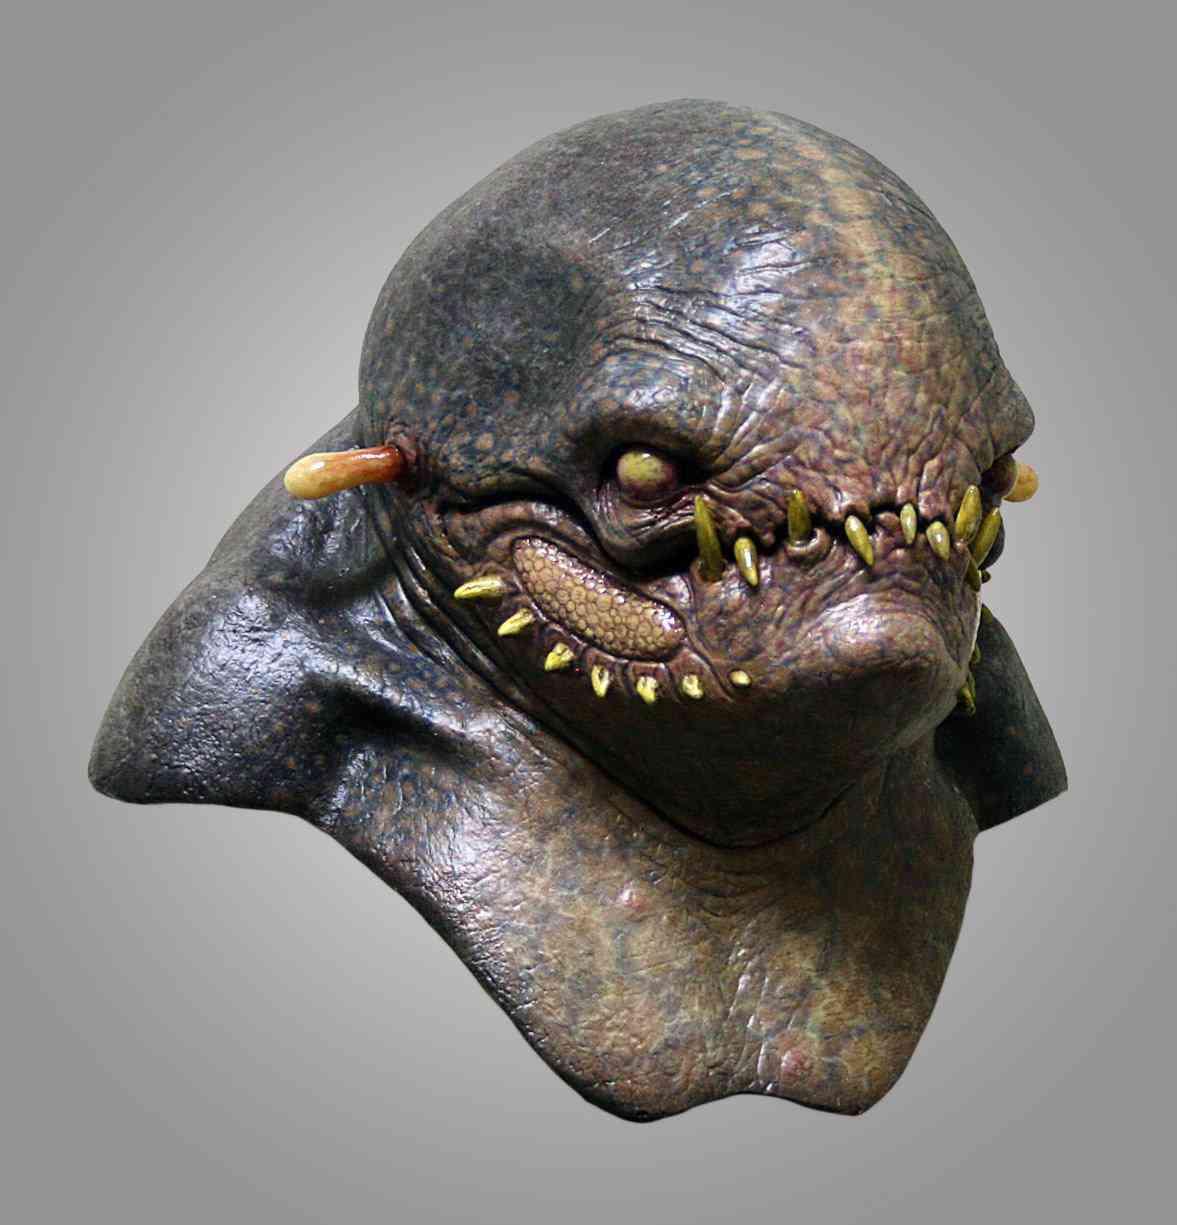 amphibious Ultra gump blaster mega pack ultimate post de monstros 6